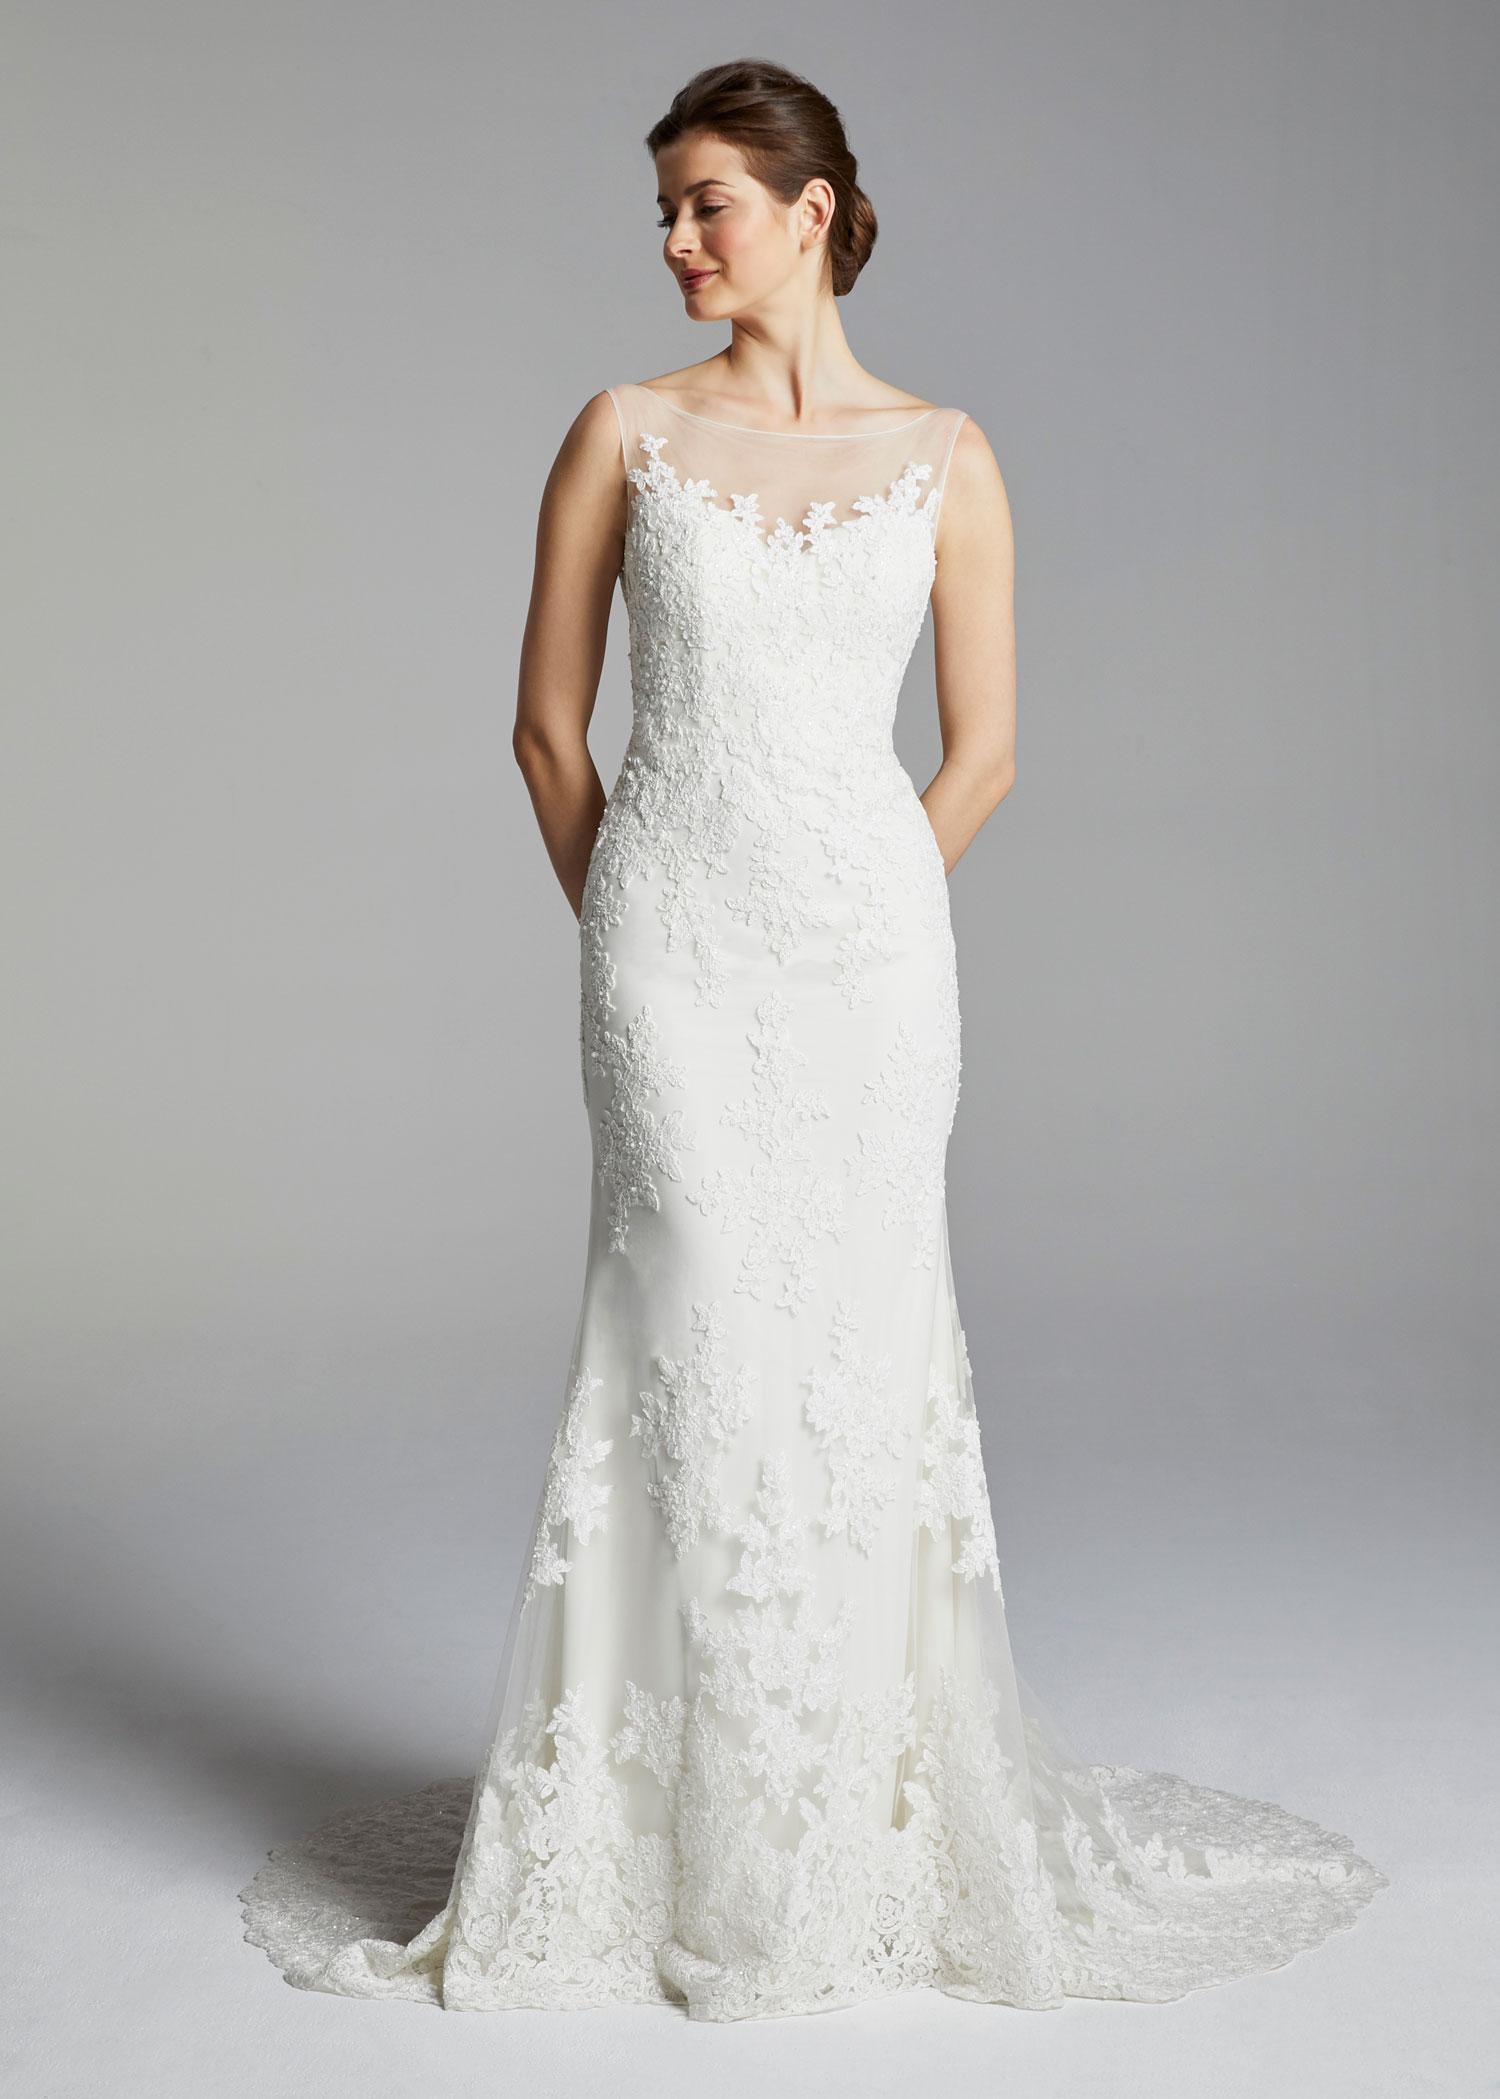 Meghan Markle Wedding Dress Designer.Be Inspired By Design Elements From Meghan Markle Wedding Dress